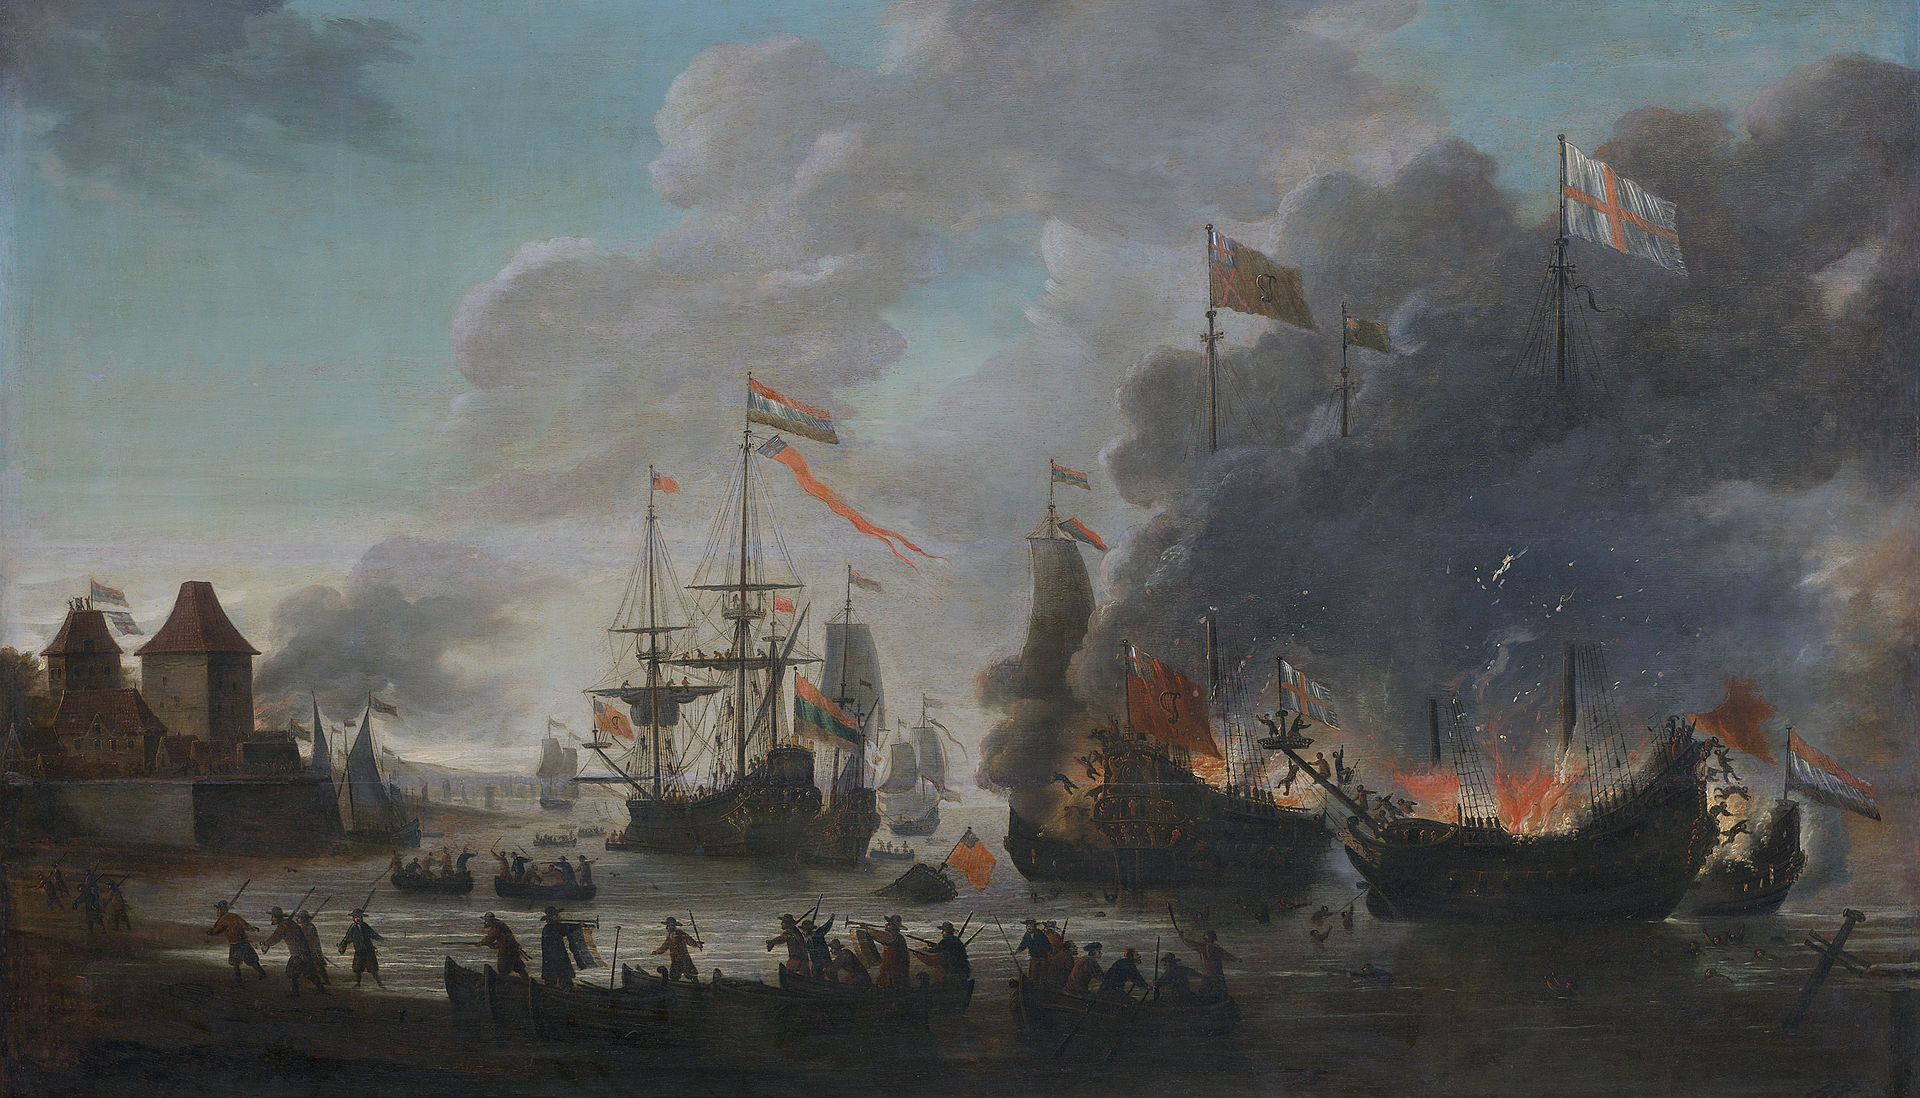 [Image: 1920px-The_Dutch_burn_English_ships_duri...669%29.jpg]